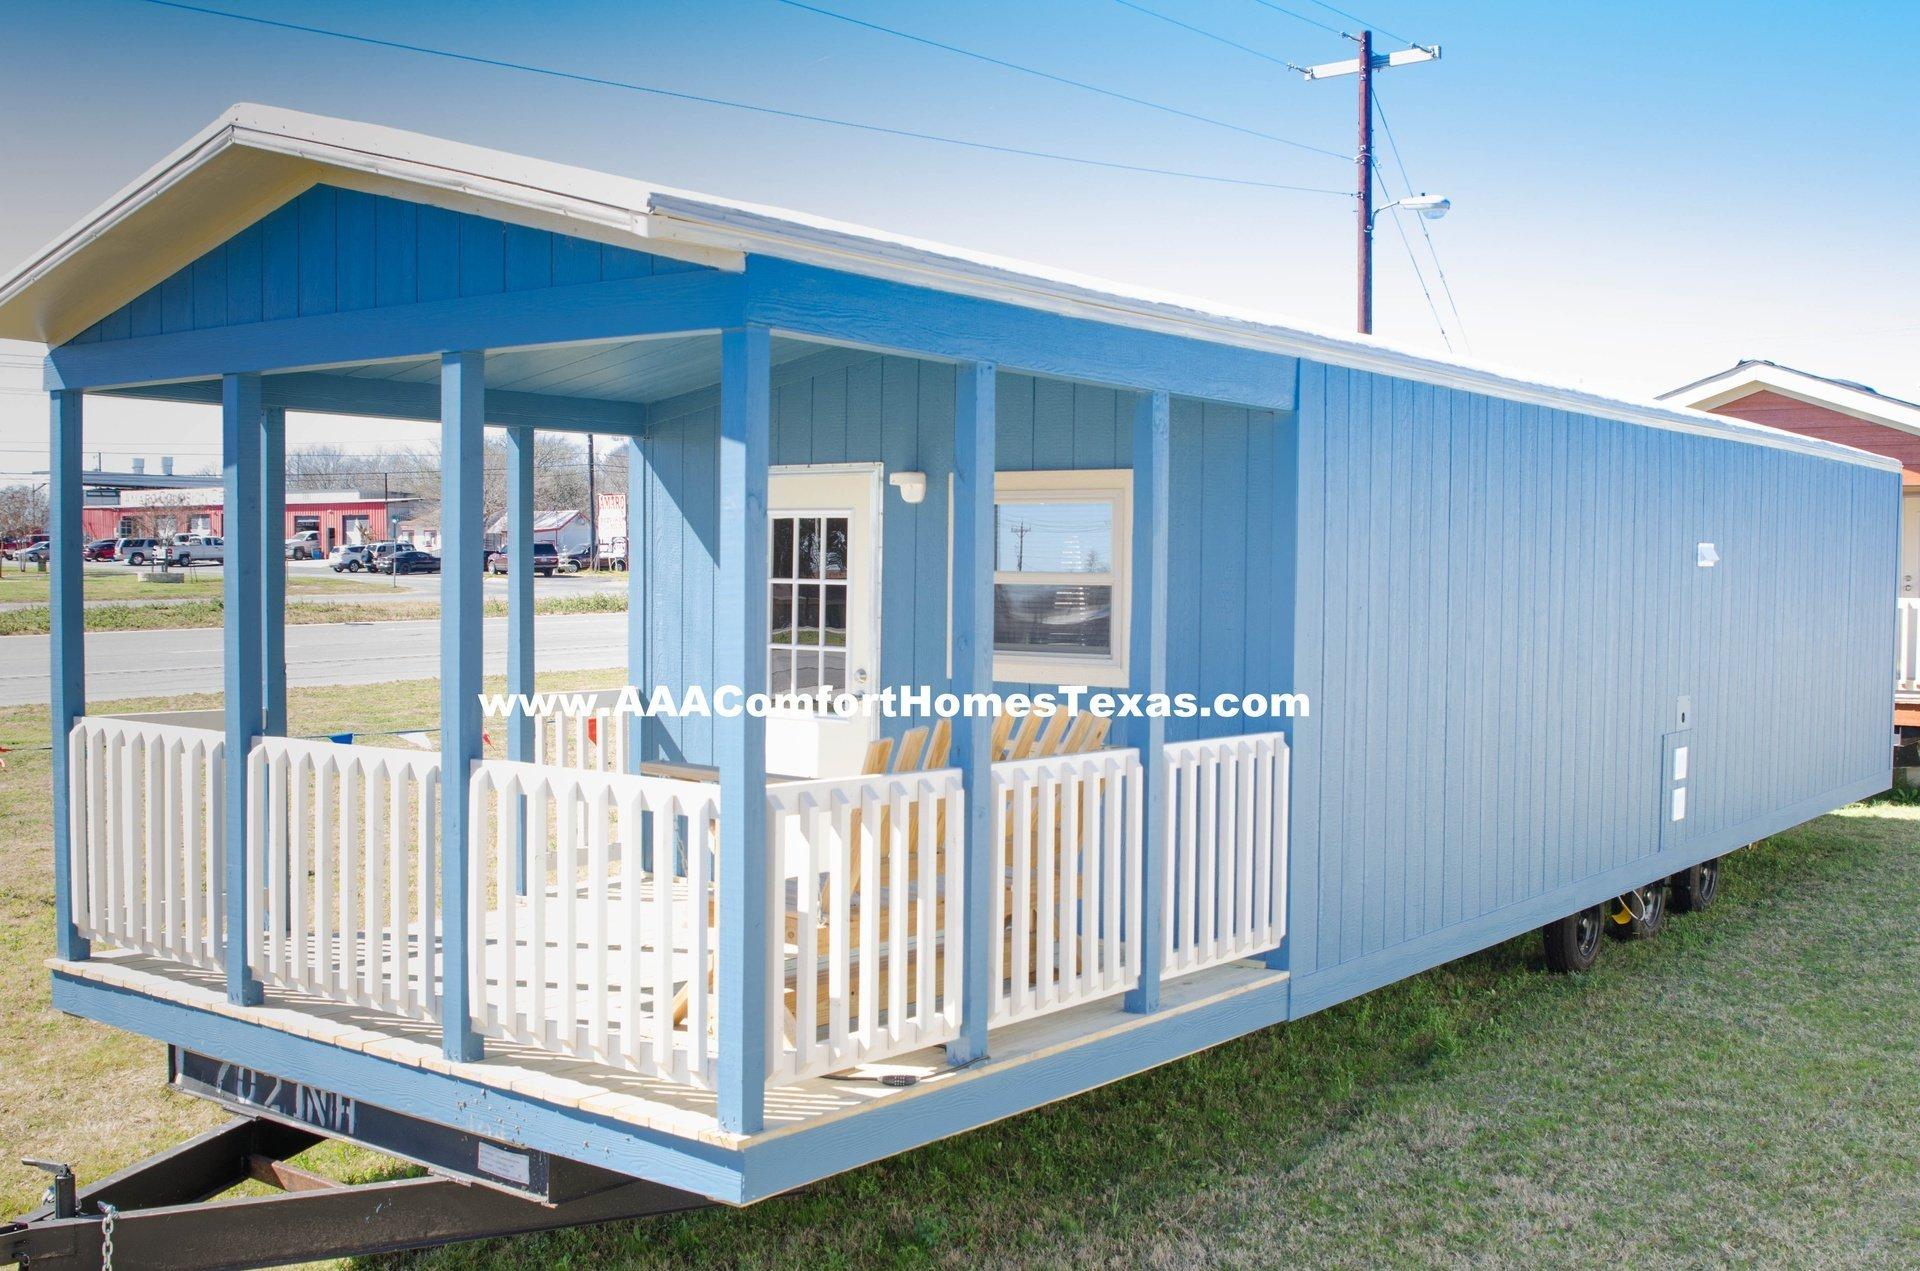 Tiny Homes in Floresville Victoria Pleasanton TX